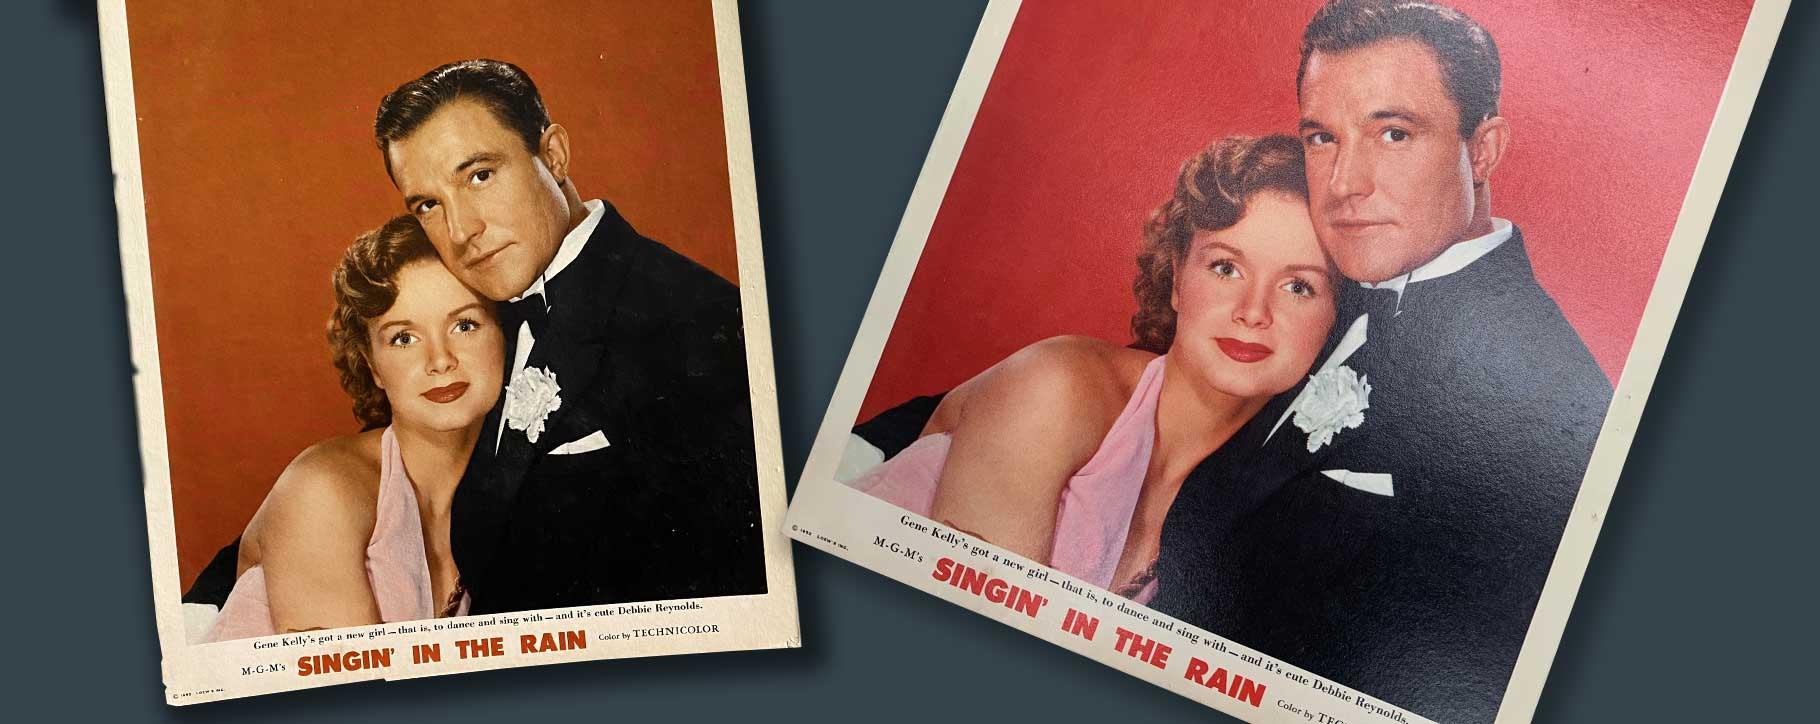 singin in the rain lobby cards restoration